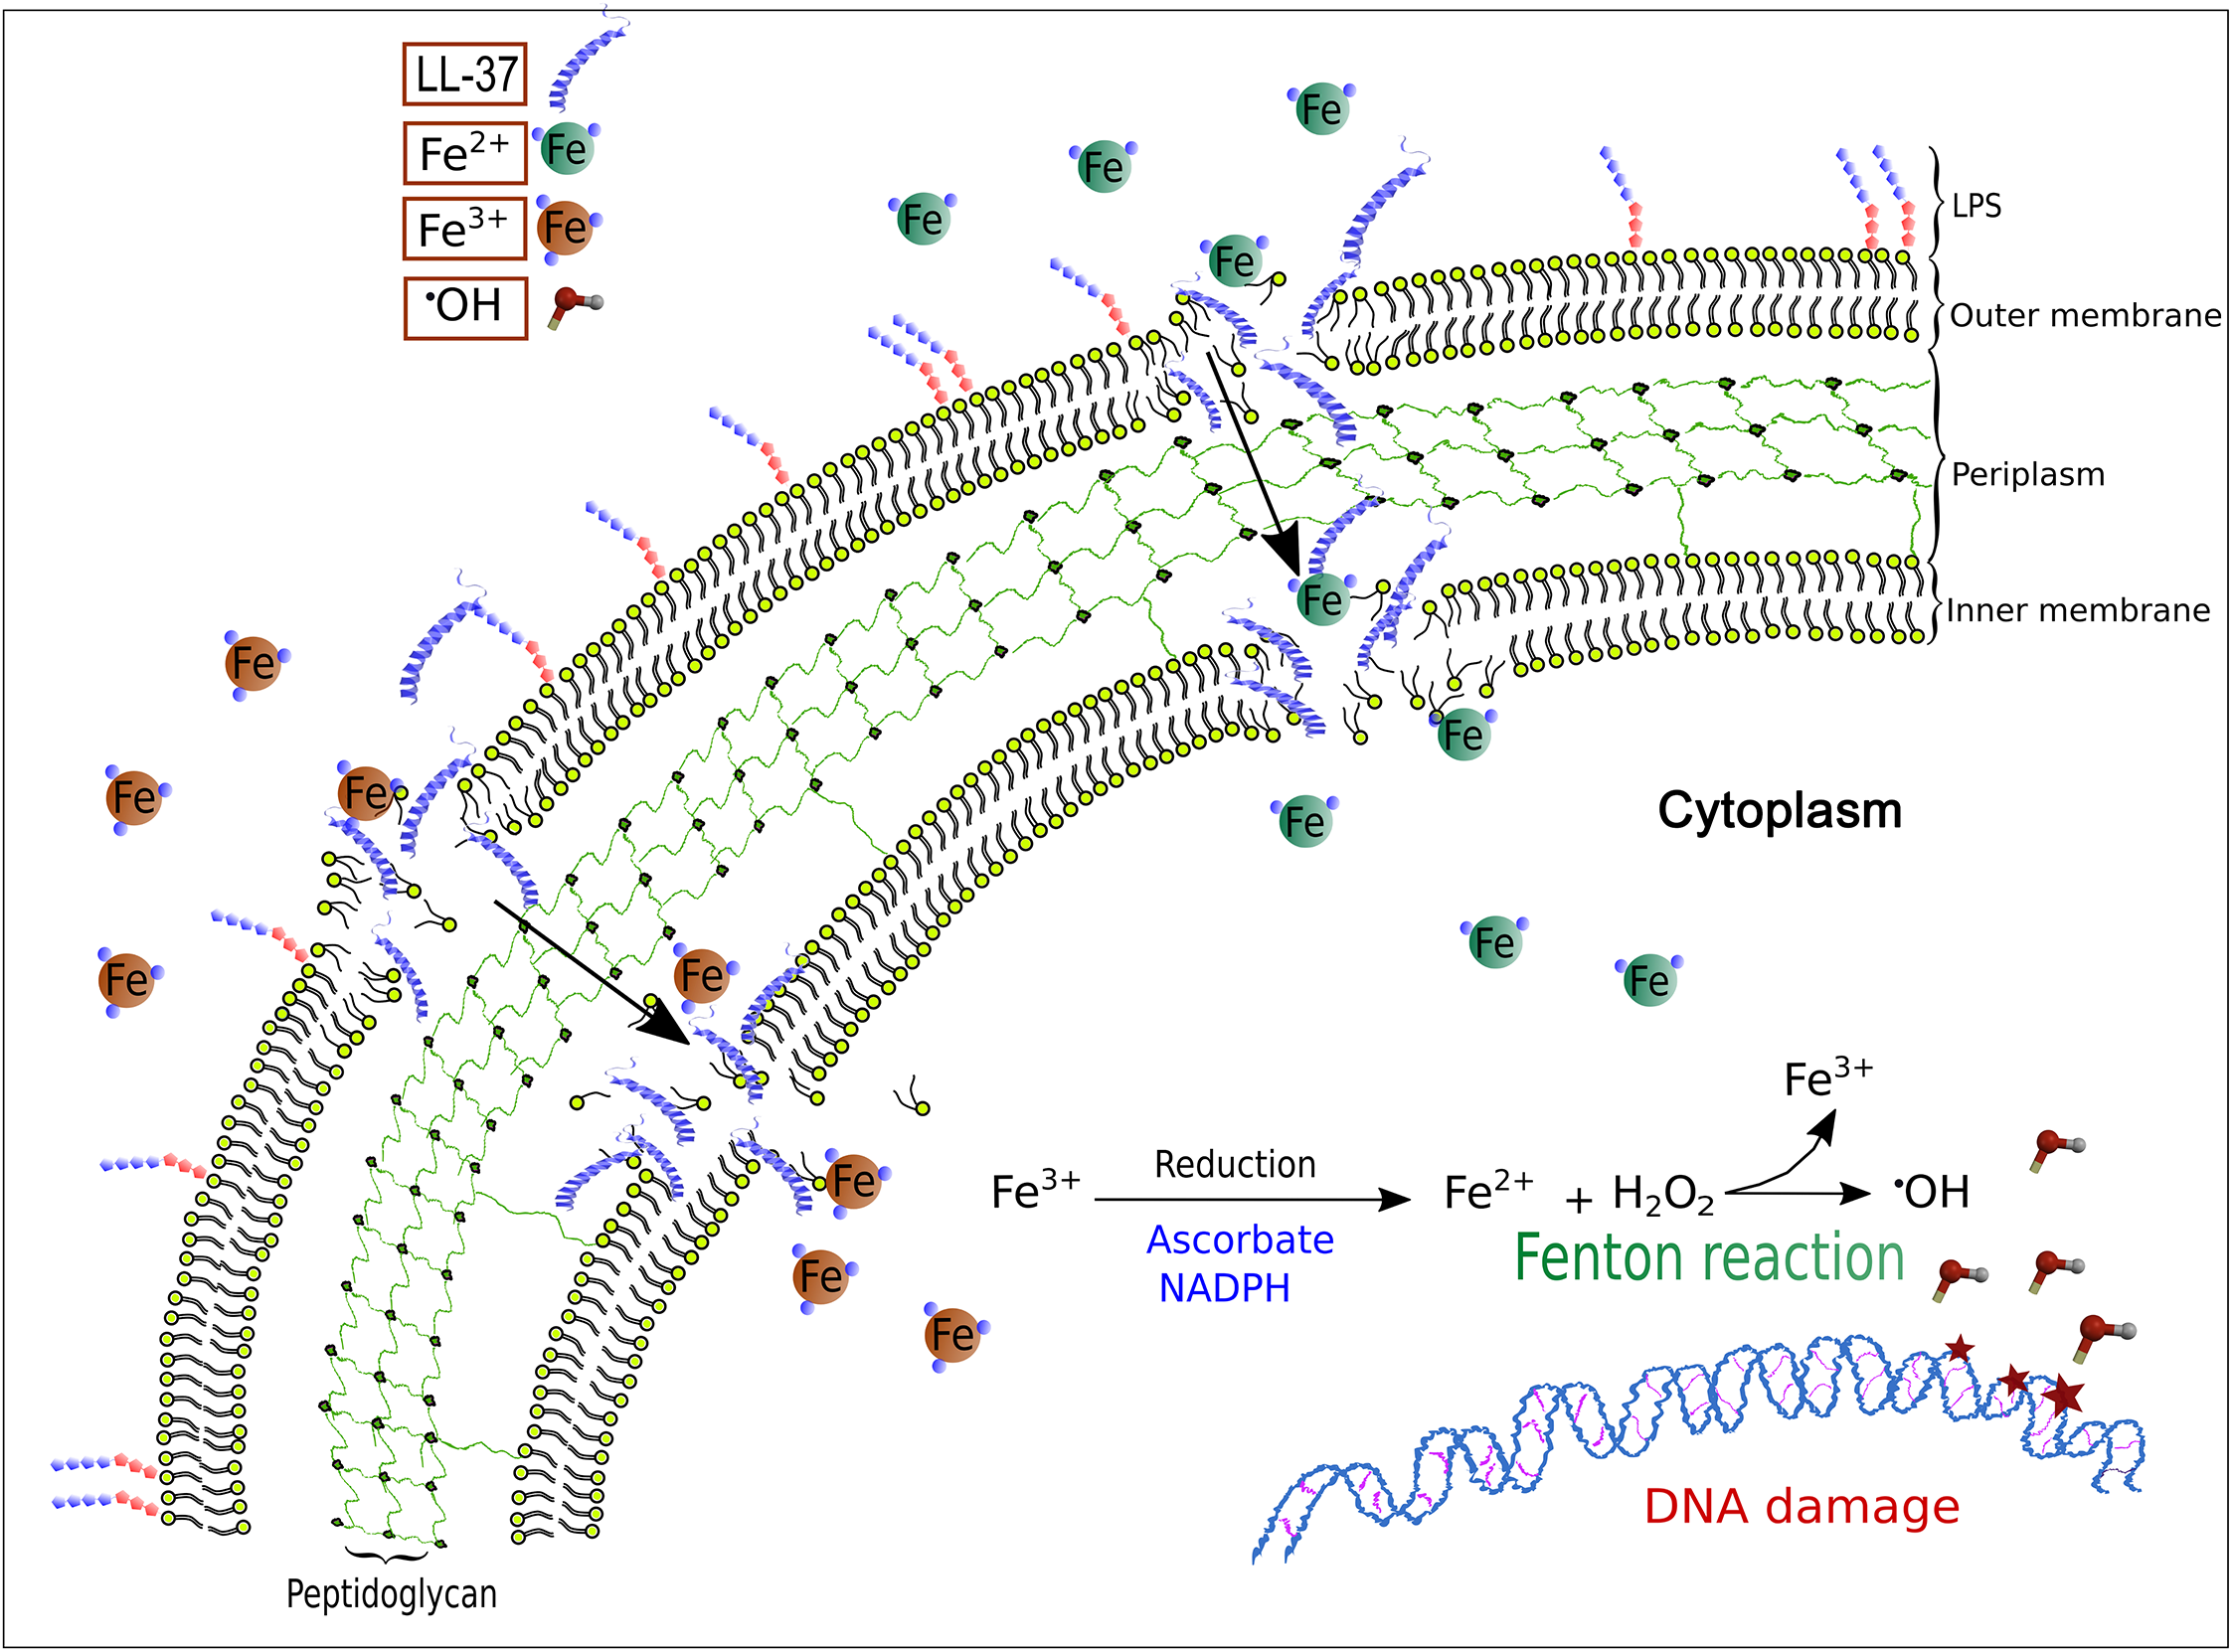 A model for LL-37-mediated, iron–induced mutagenesis in <i>Pseudomonas aeruginosa</i>.